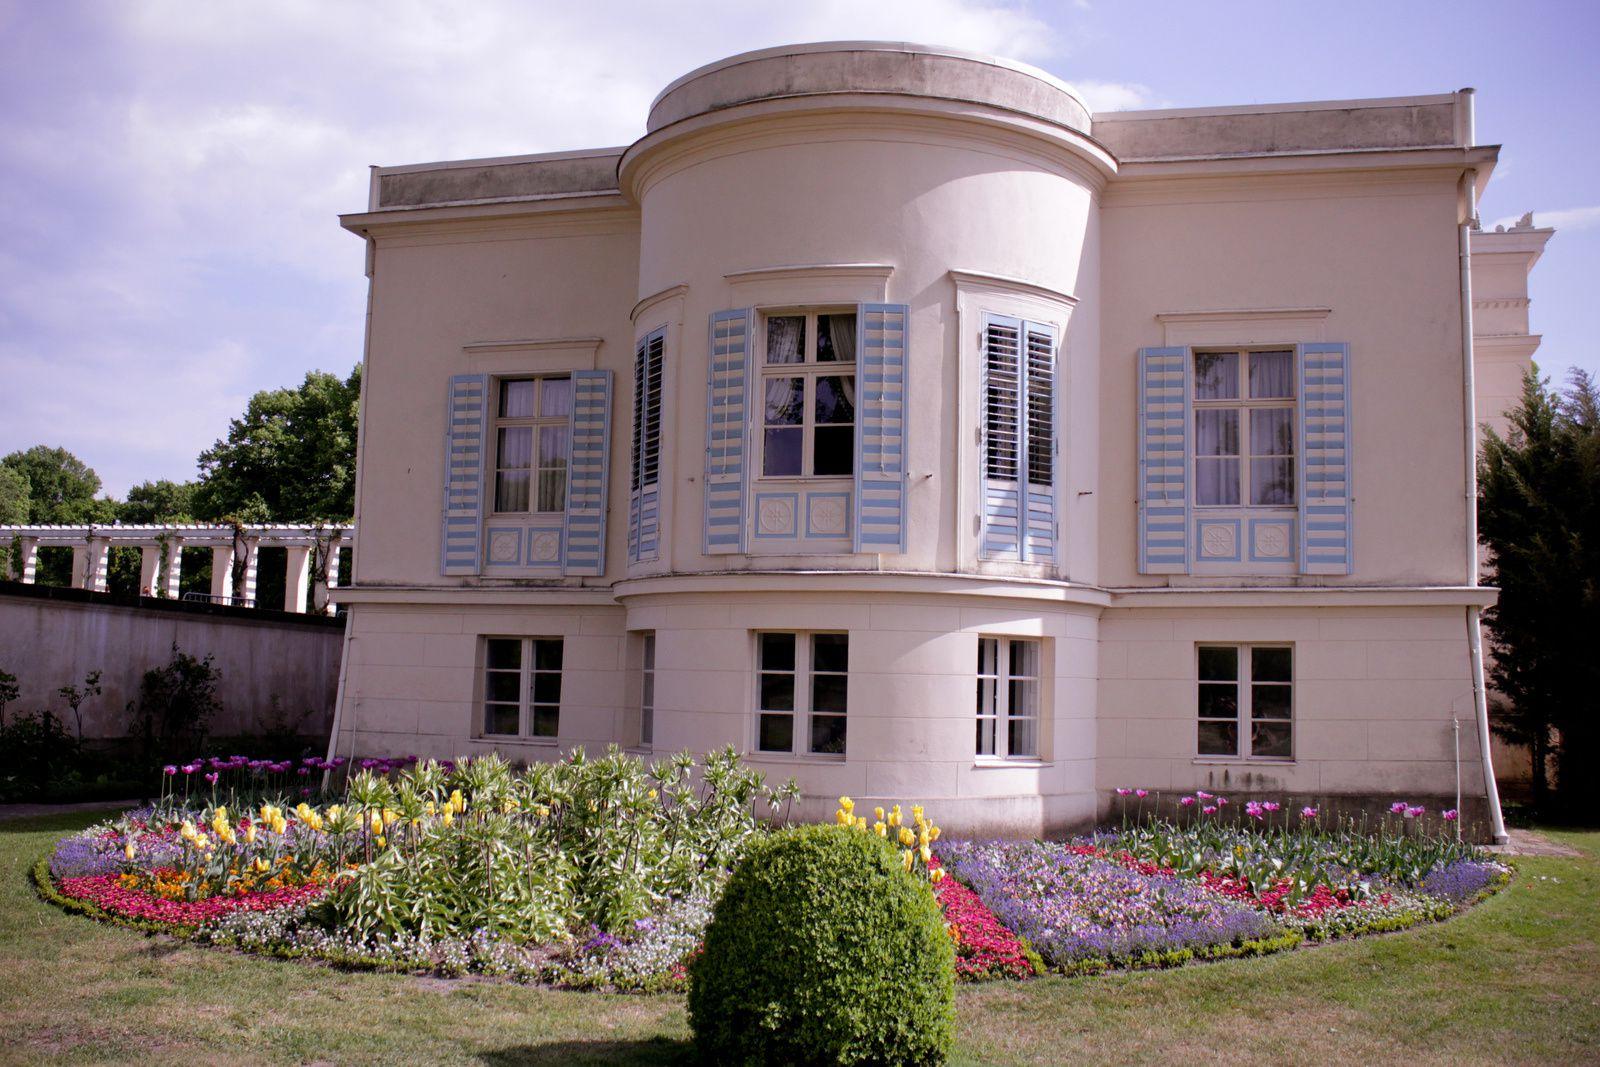 Le Château de Charlottenhof